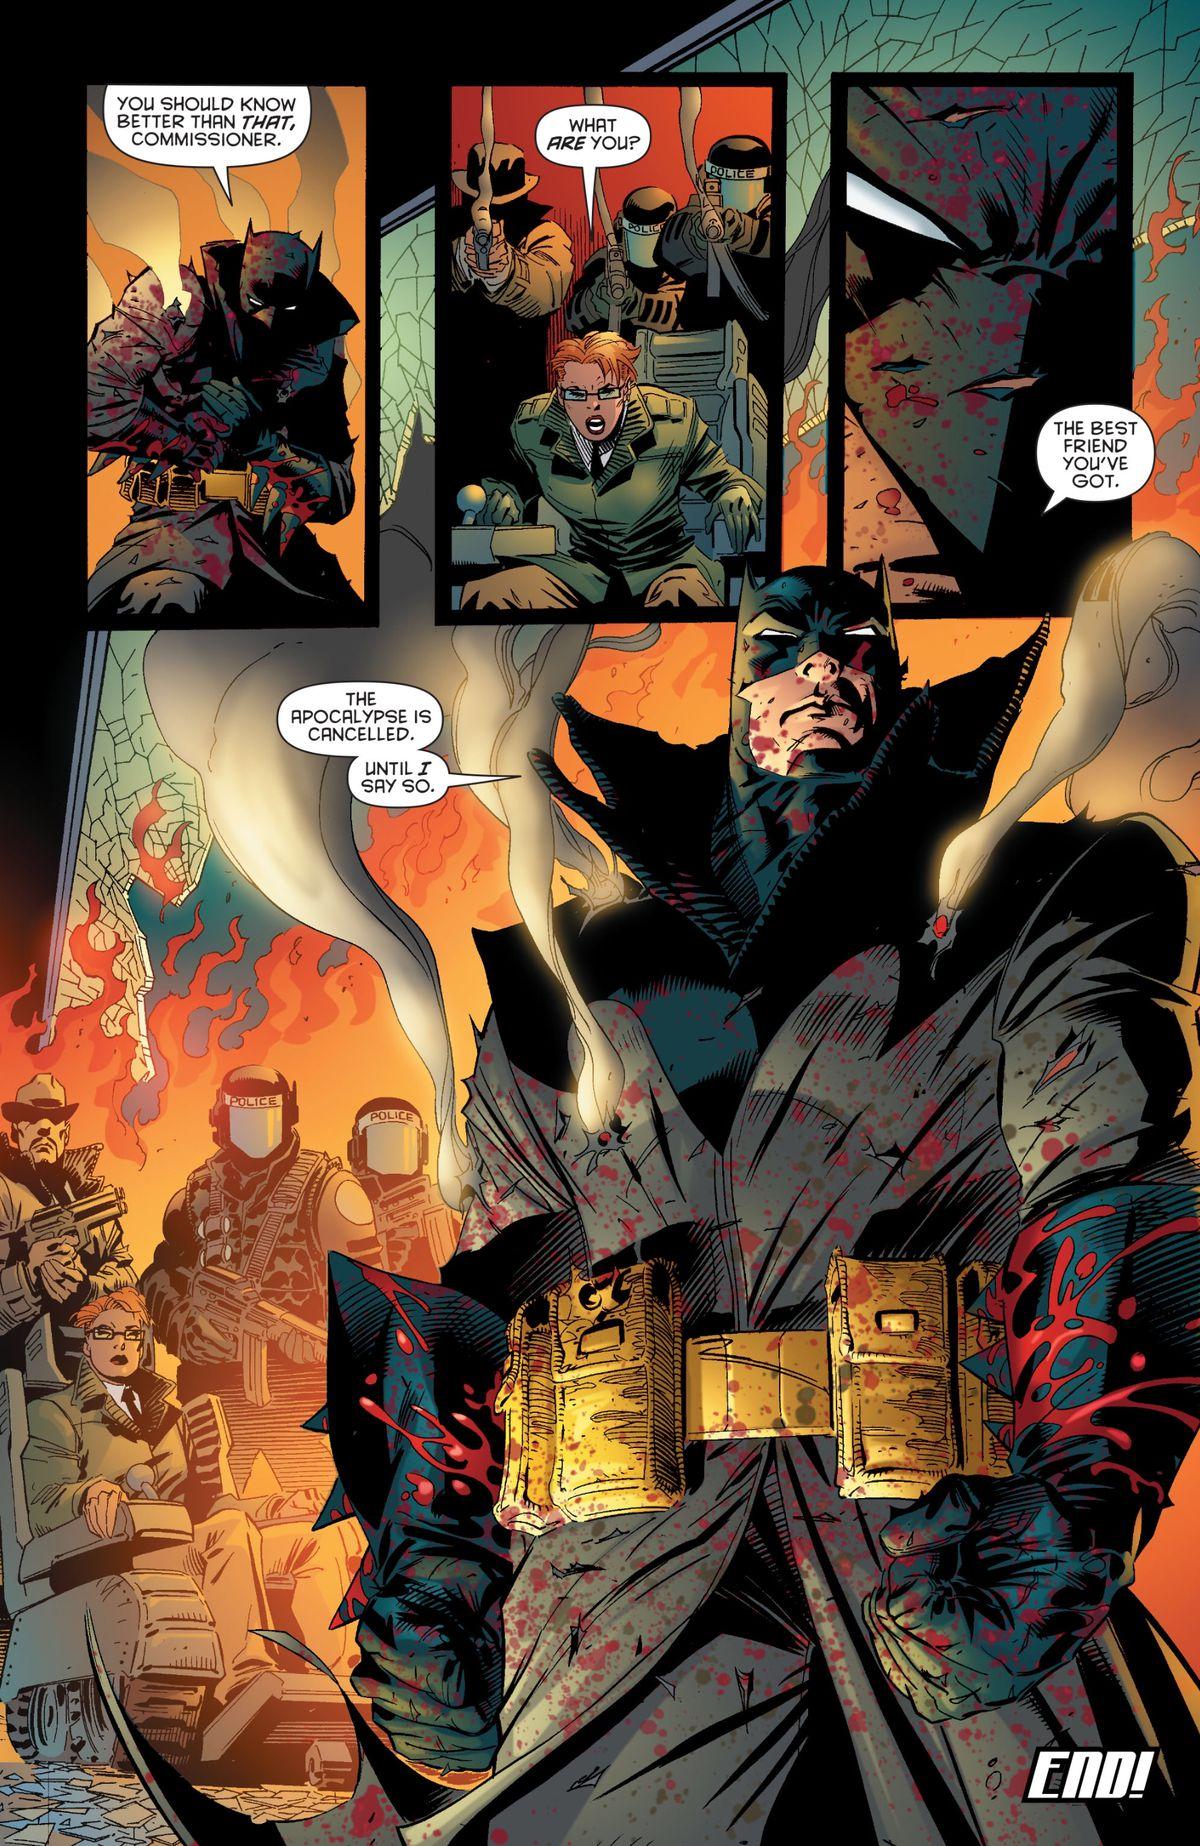 An adult Damian Wayne as a potential future Batman, in Batman #666, DC Comics (2007).